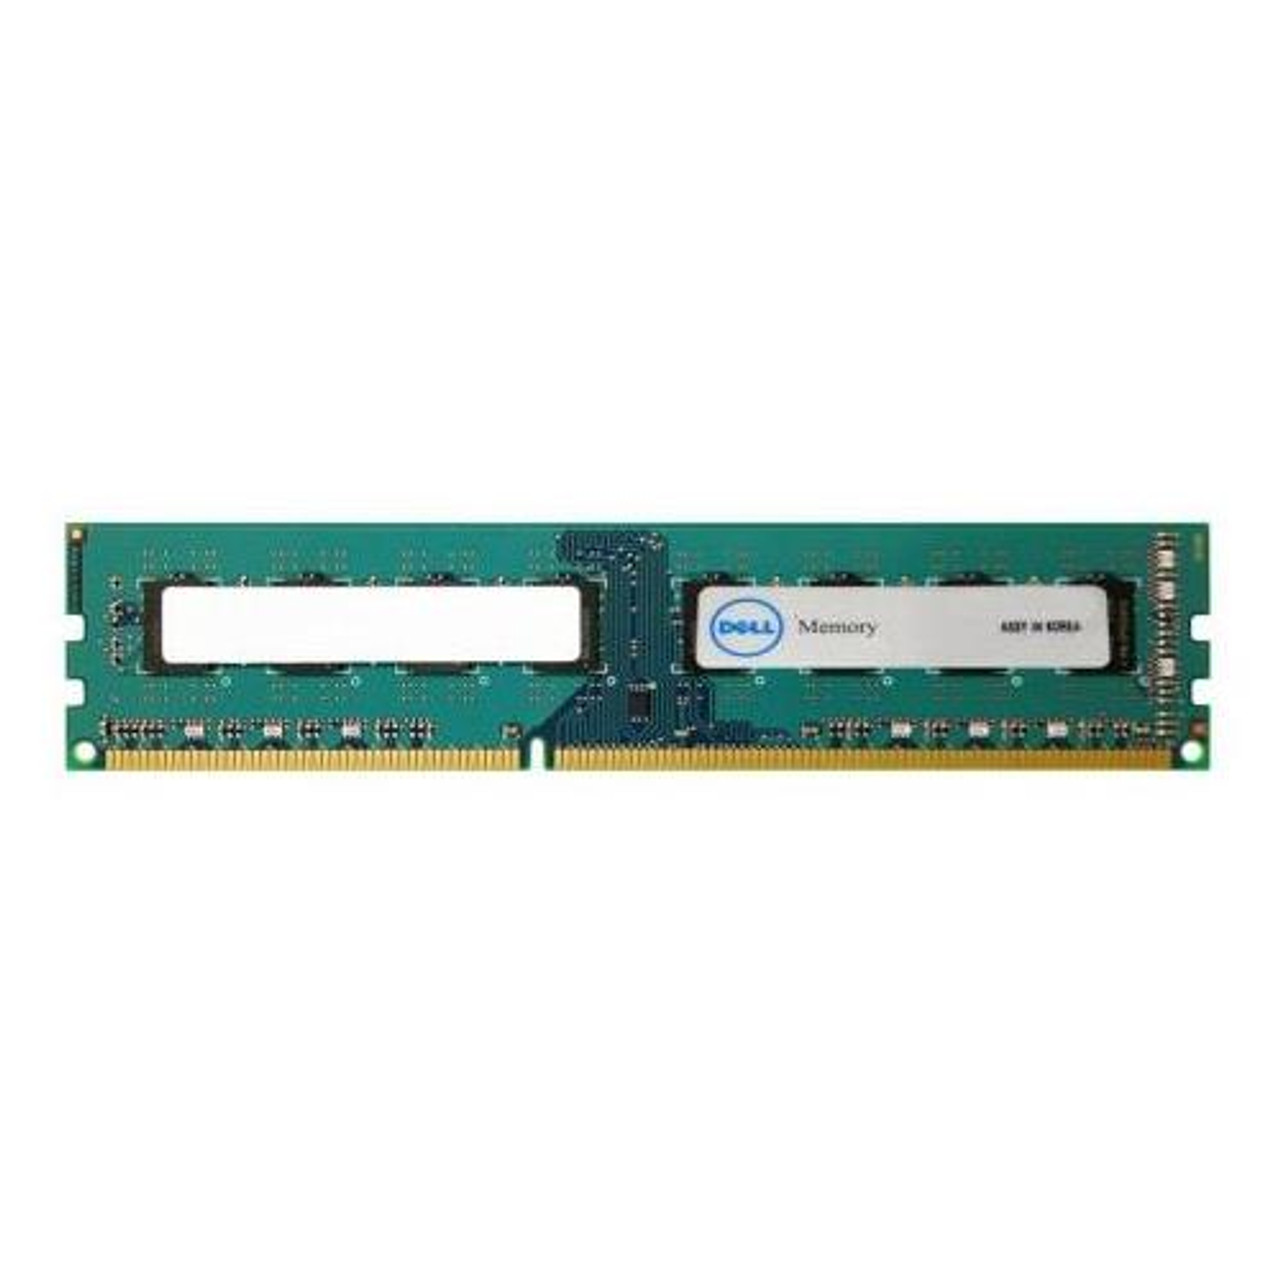 Renewed Intel AT80614005940AA XEON L5609 1.86G 12M LGA1366 4.8FT//S DDR3 1333MHZ TRAY